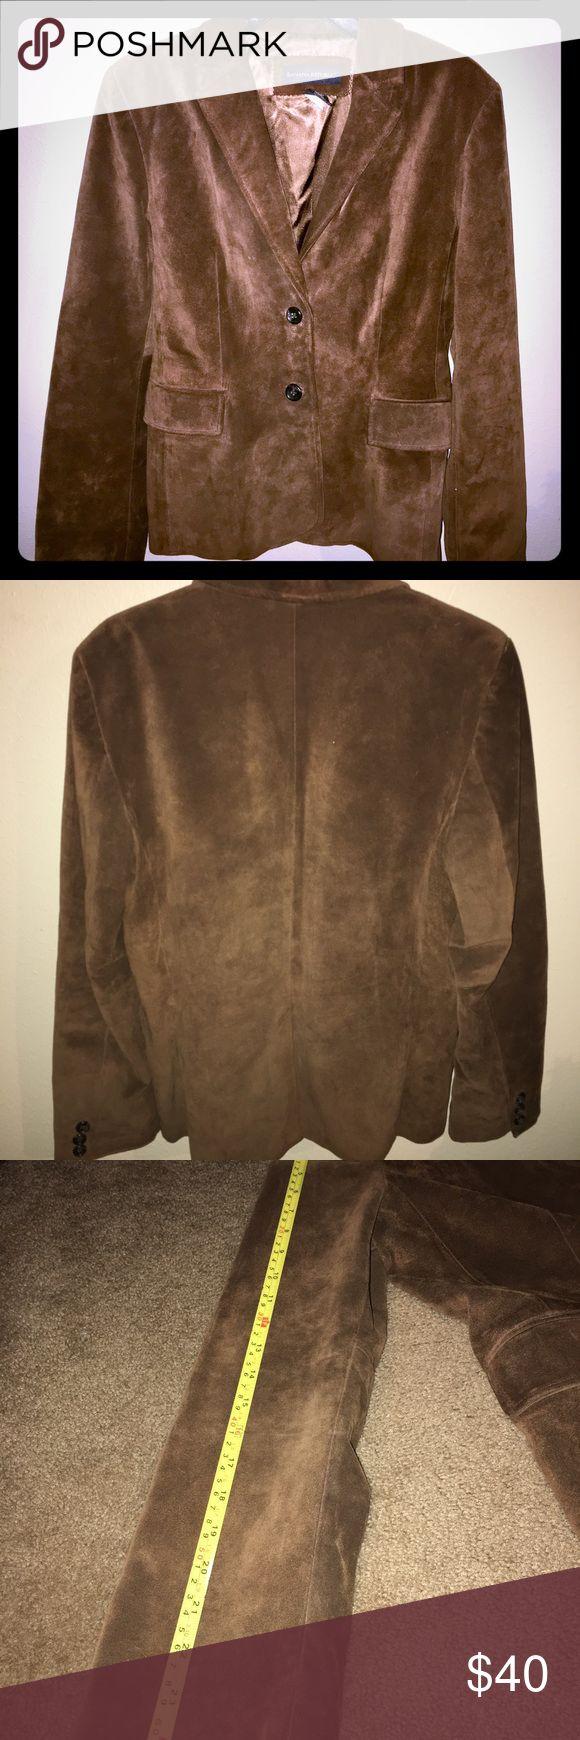 Banana Republic Size 10 Leather blazer jacket Clean pre owned Pet free and smoke free home Banana Republic Jackets & Coats Blazers